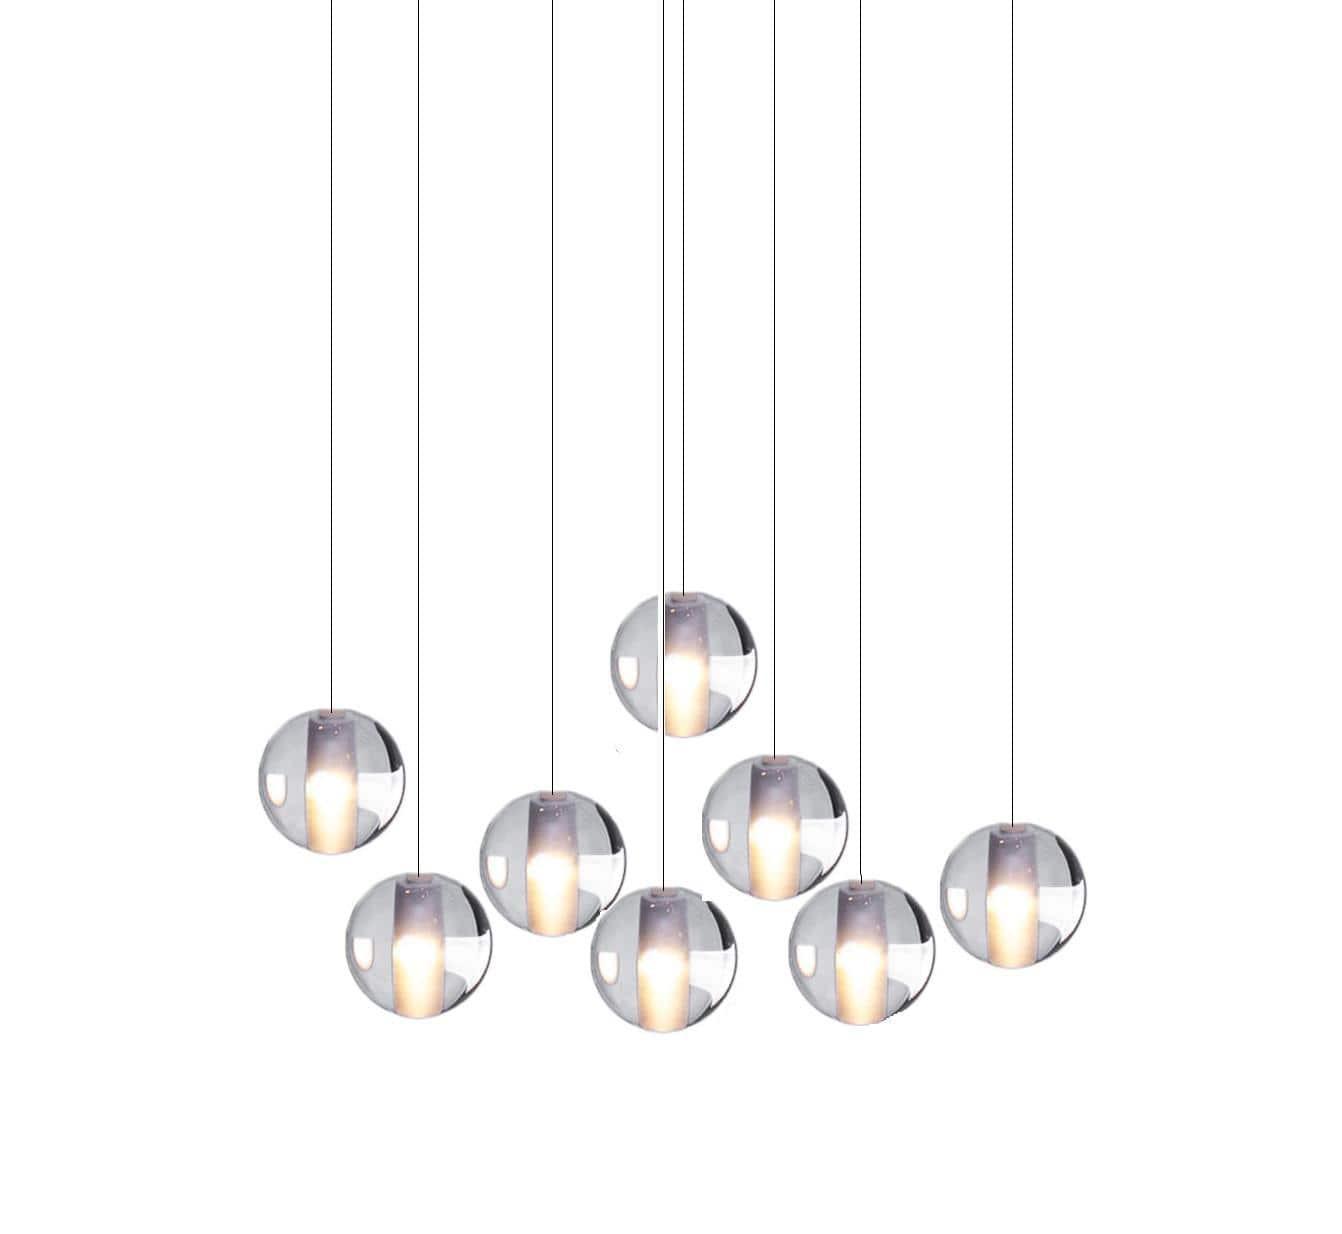 globe lighting - rbpl8 PFVQTRW